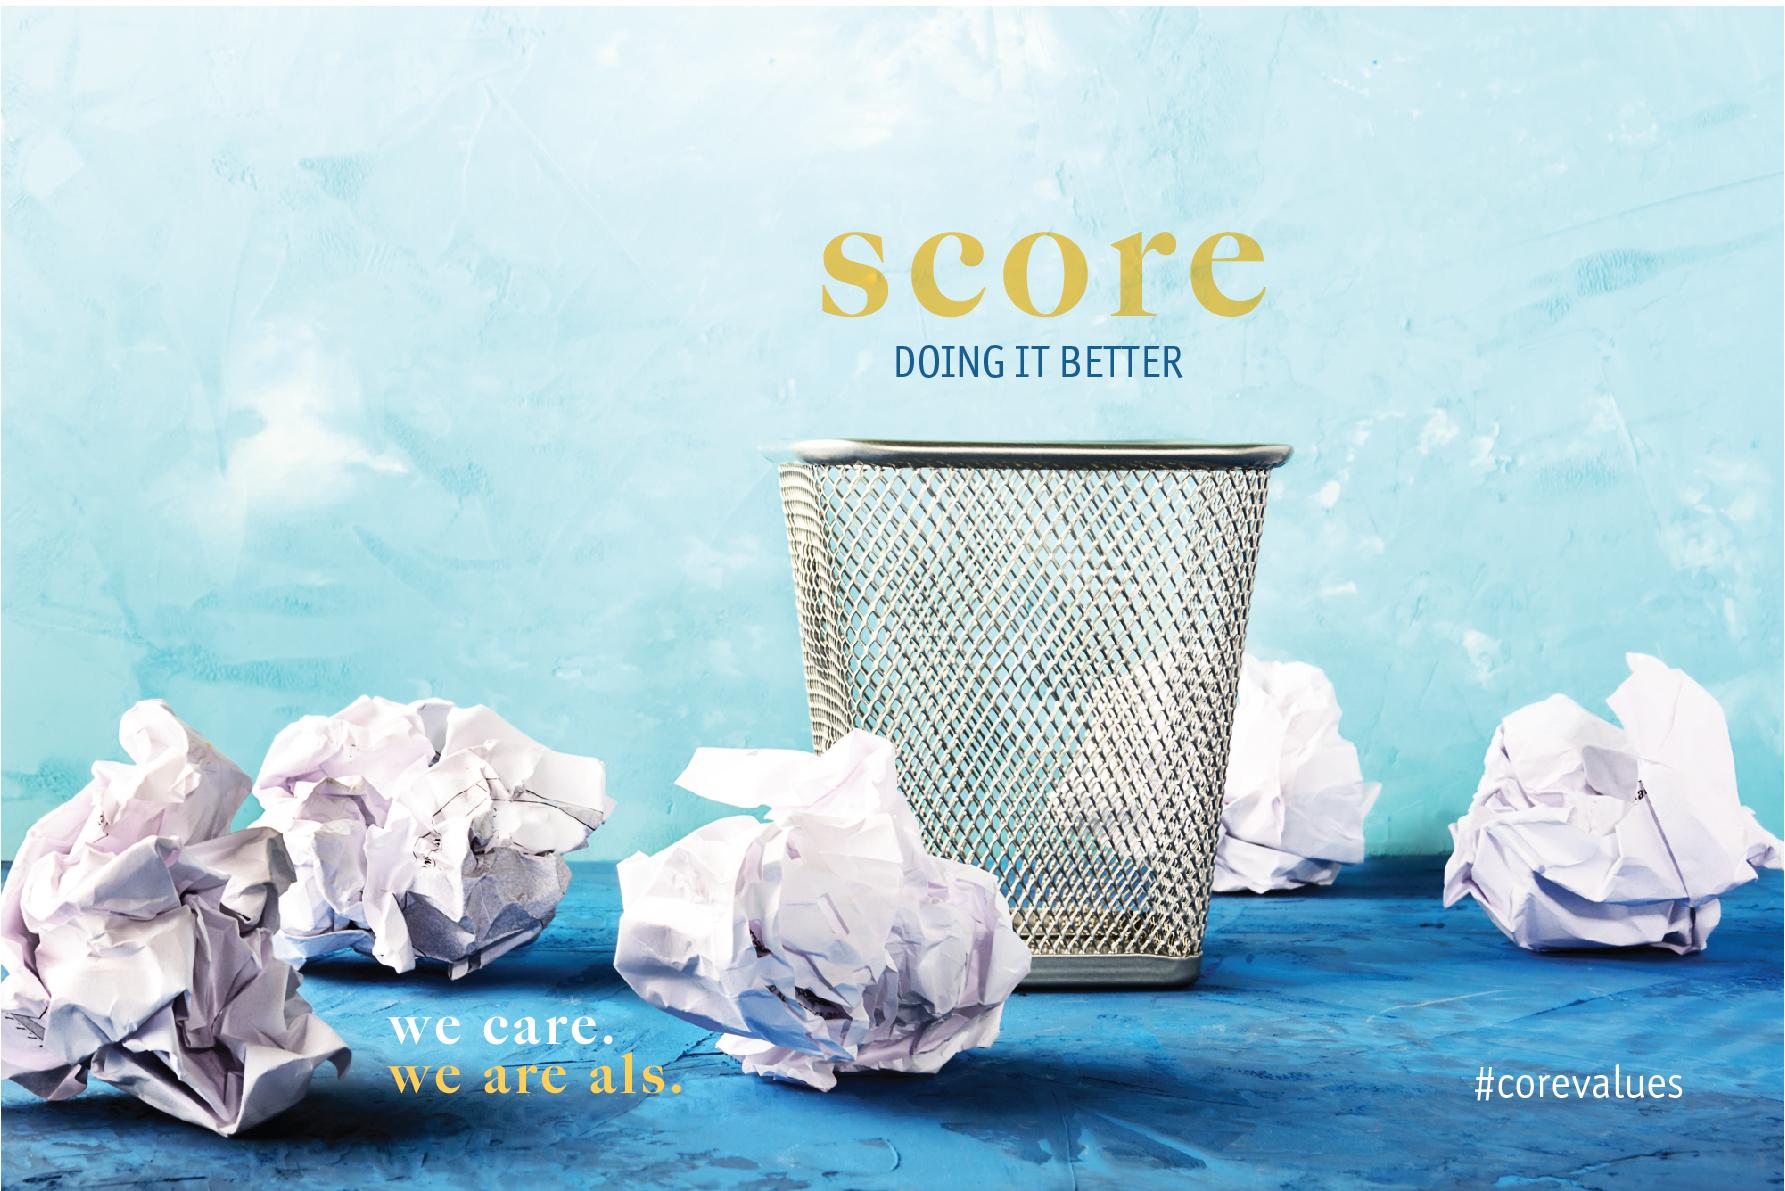 ALS core values score